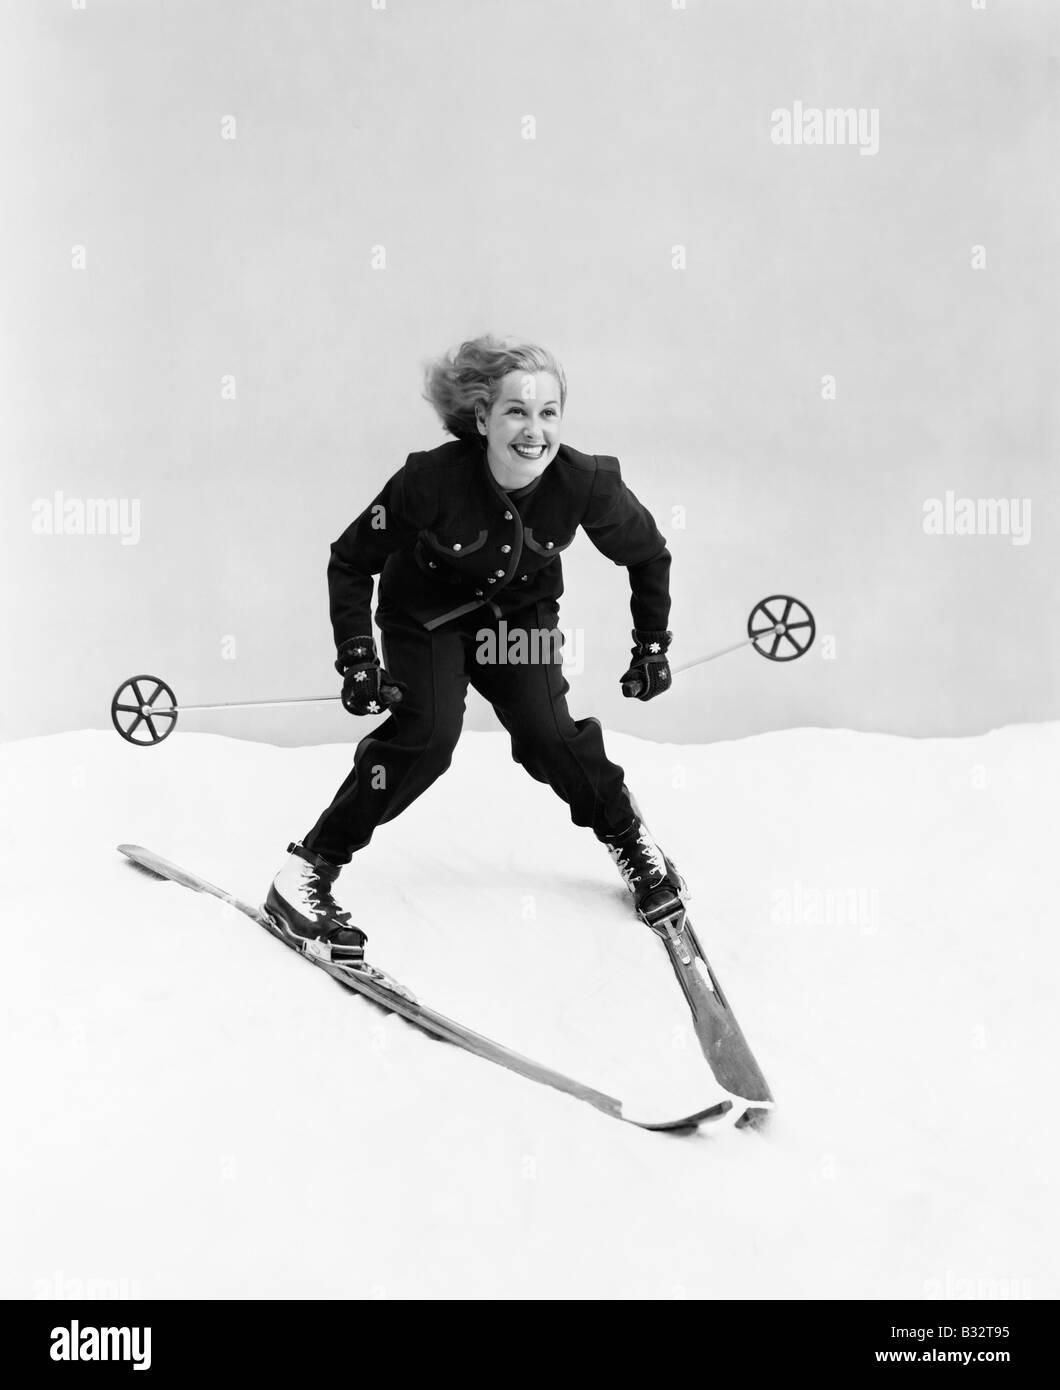 Ski alpin ski féminin Photo Stock